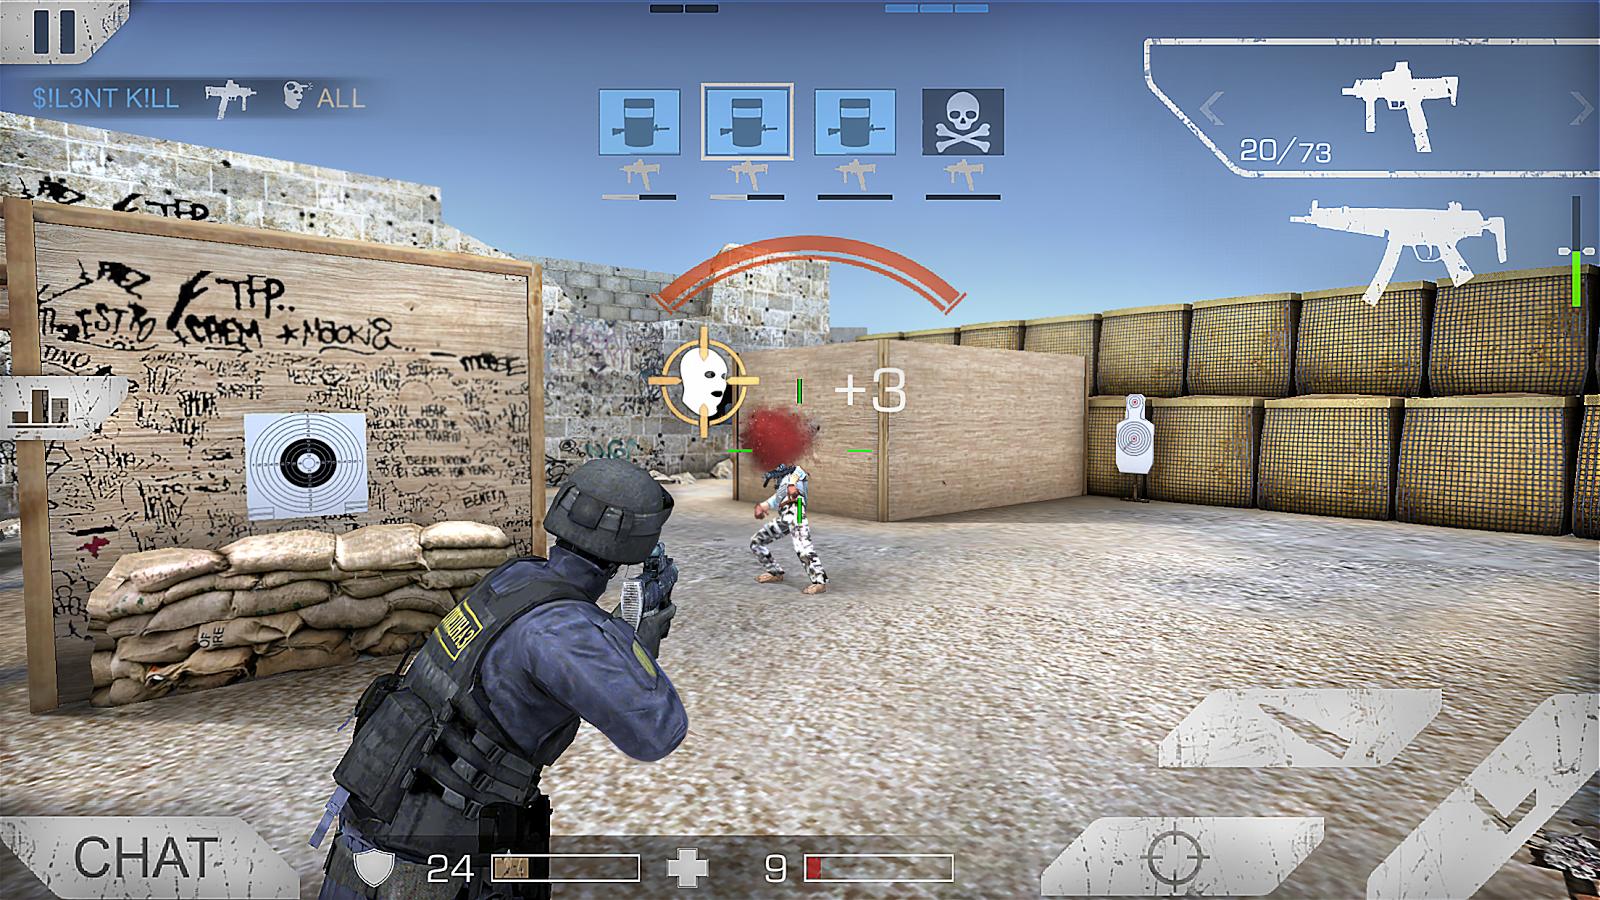 Standoff Multiplayer